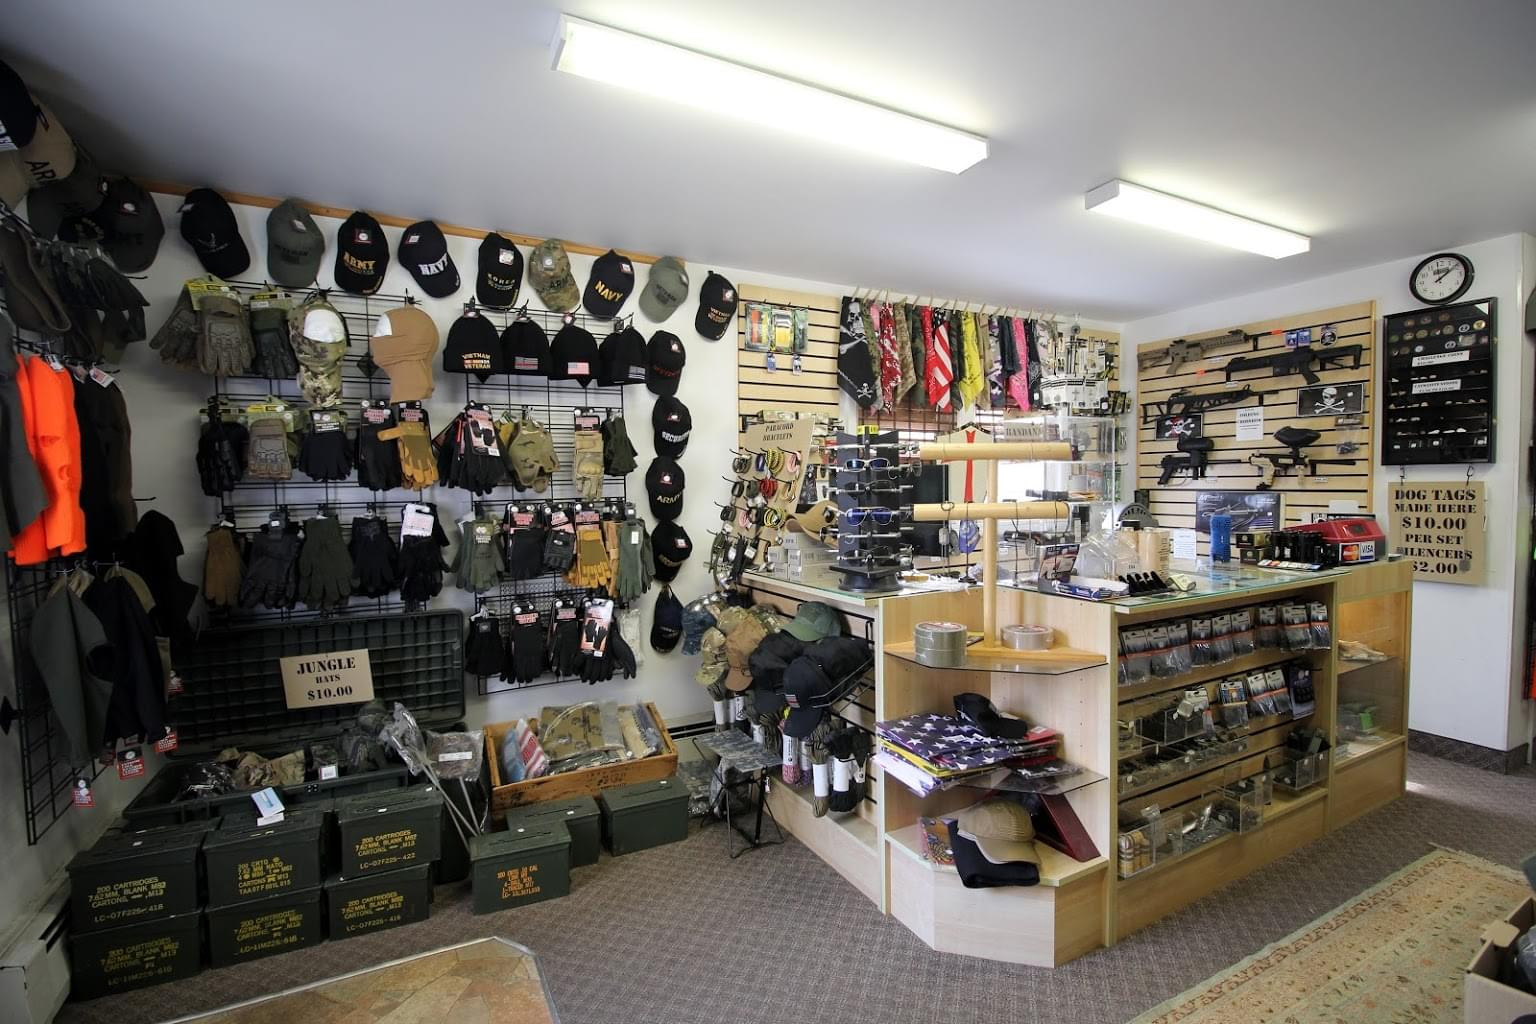 Grandpops Army Navy supply store in Swedesboro, NJ